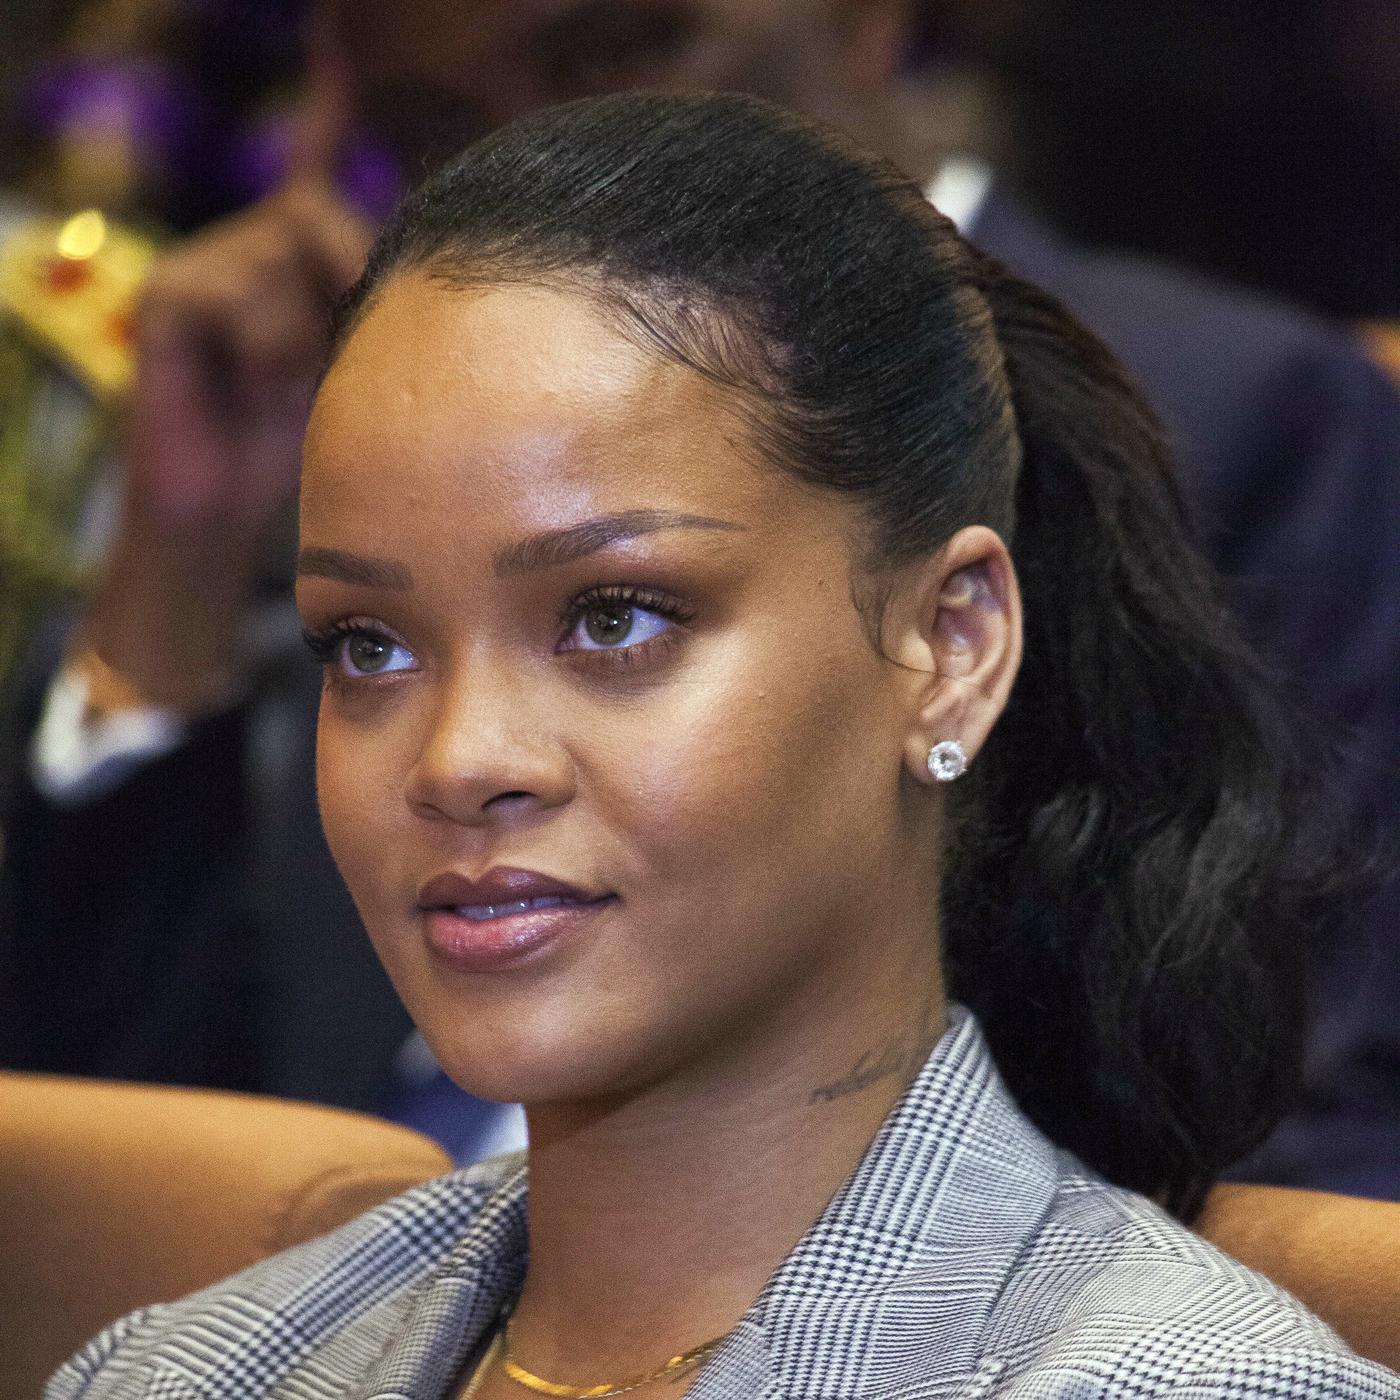 Snapchat's Stock Sinks After Rihanna Denounces Domestic